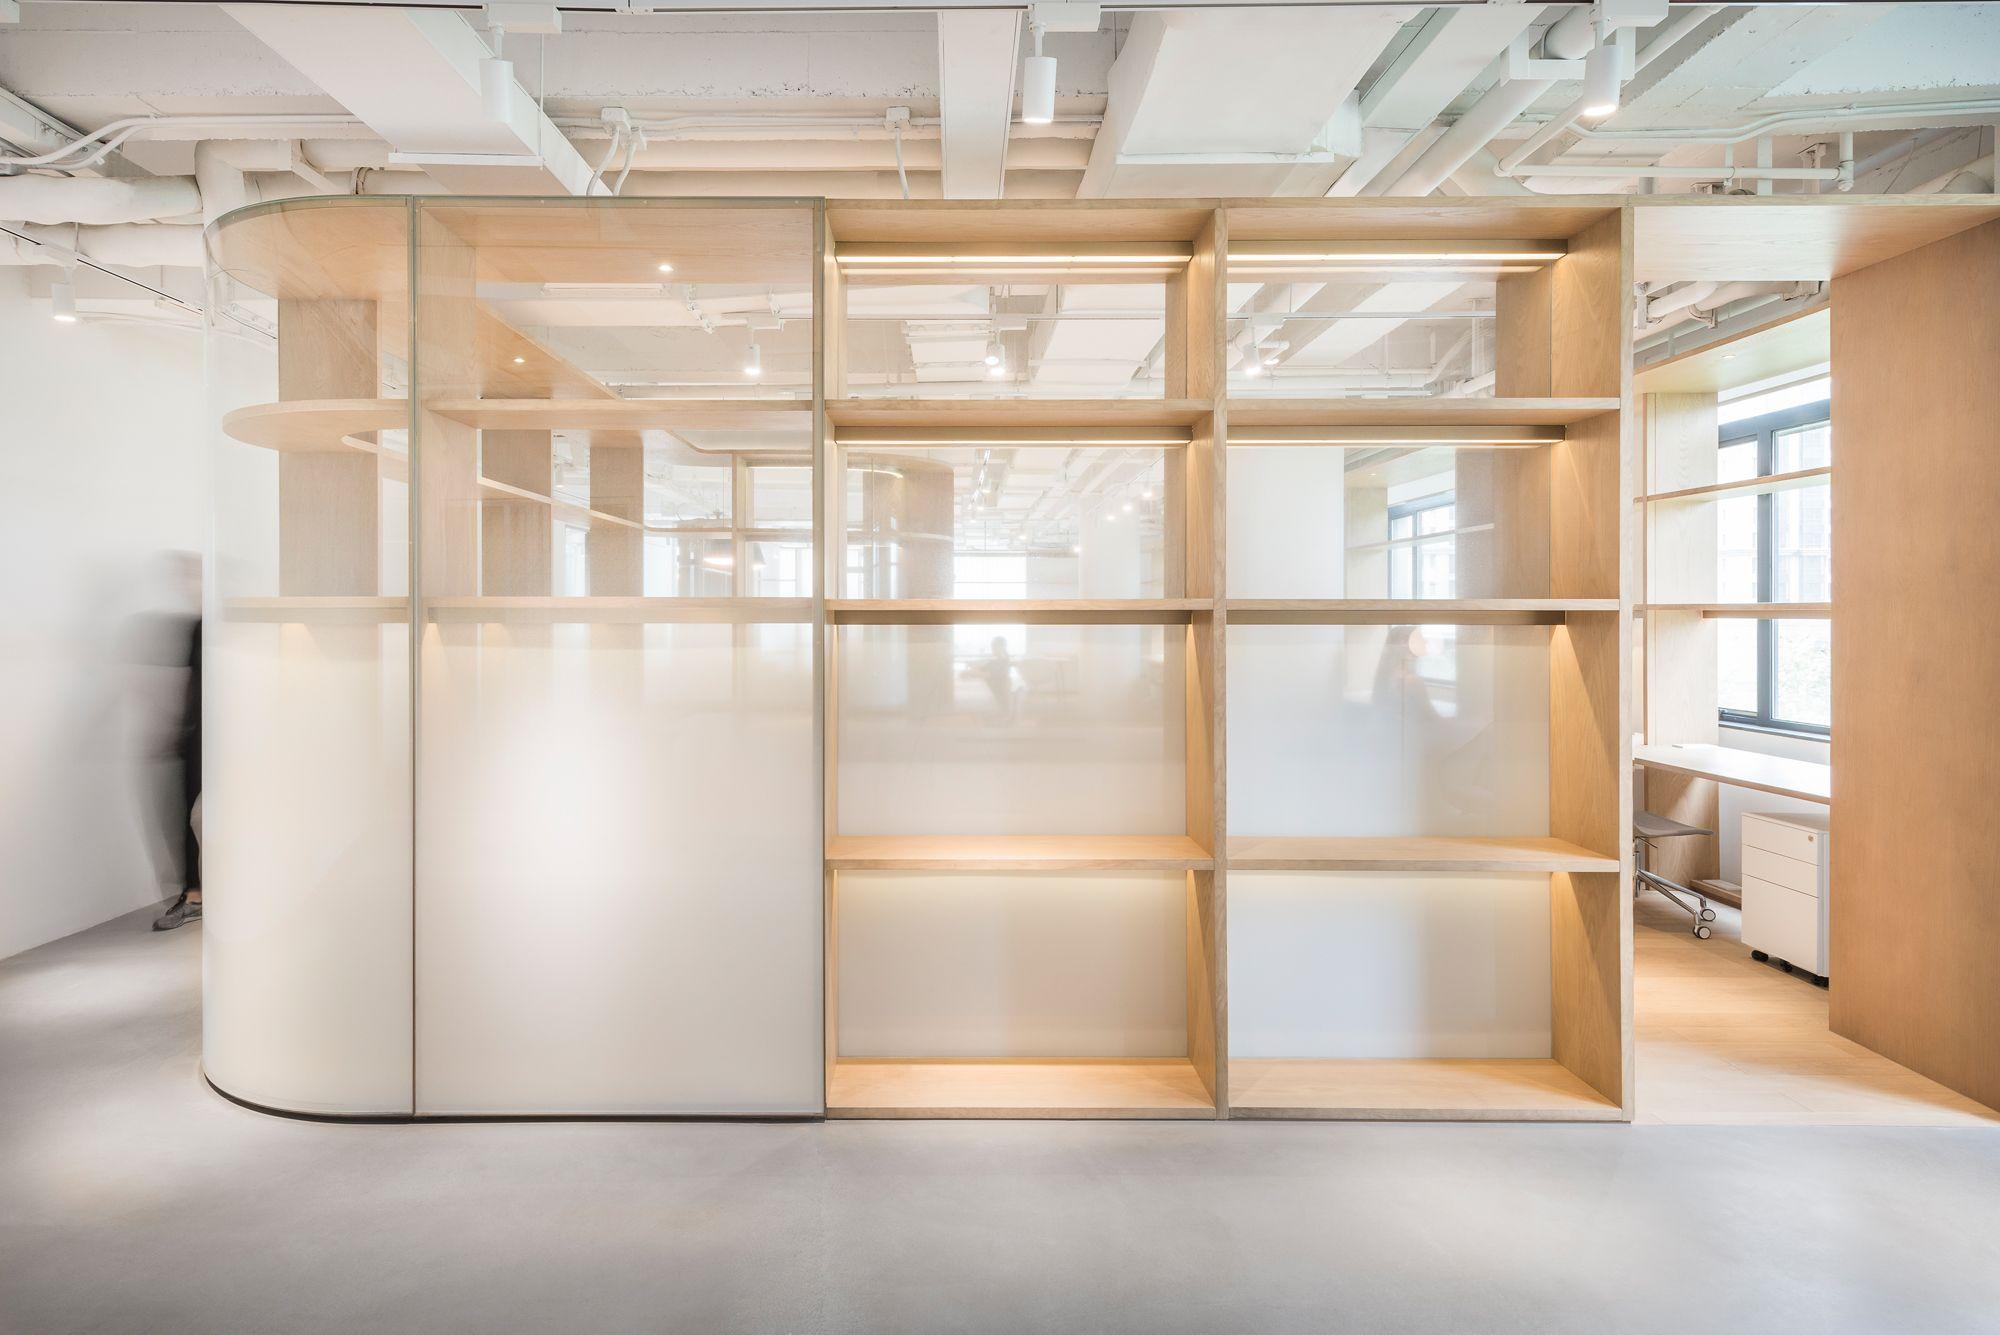 Mobiliar bildet Raum: Bürogestaltung in Shanghai | Shanghai, Wand ...